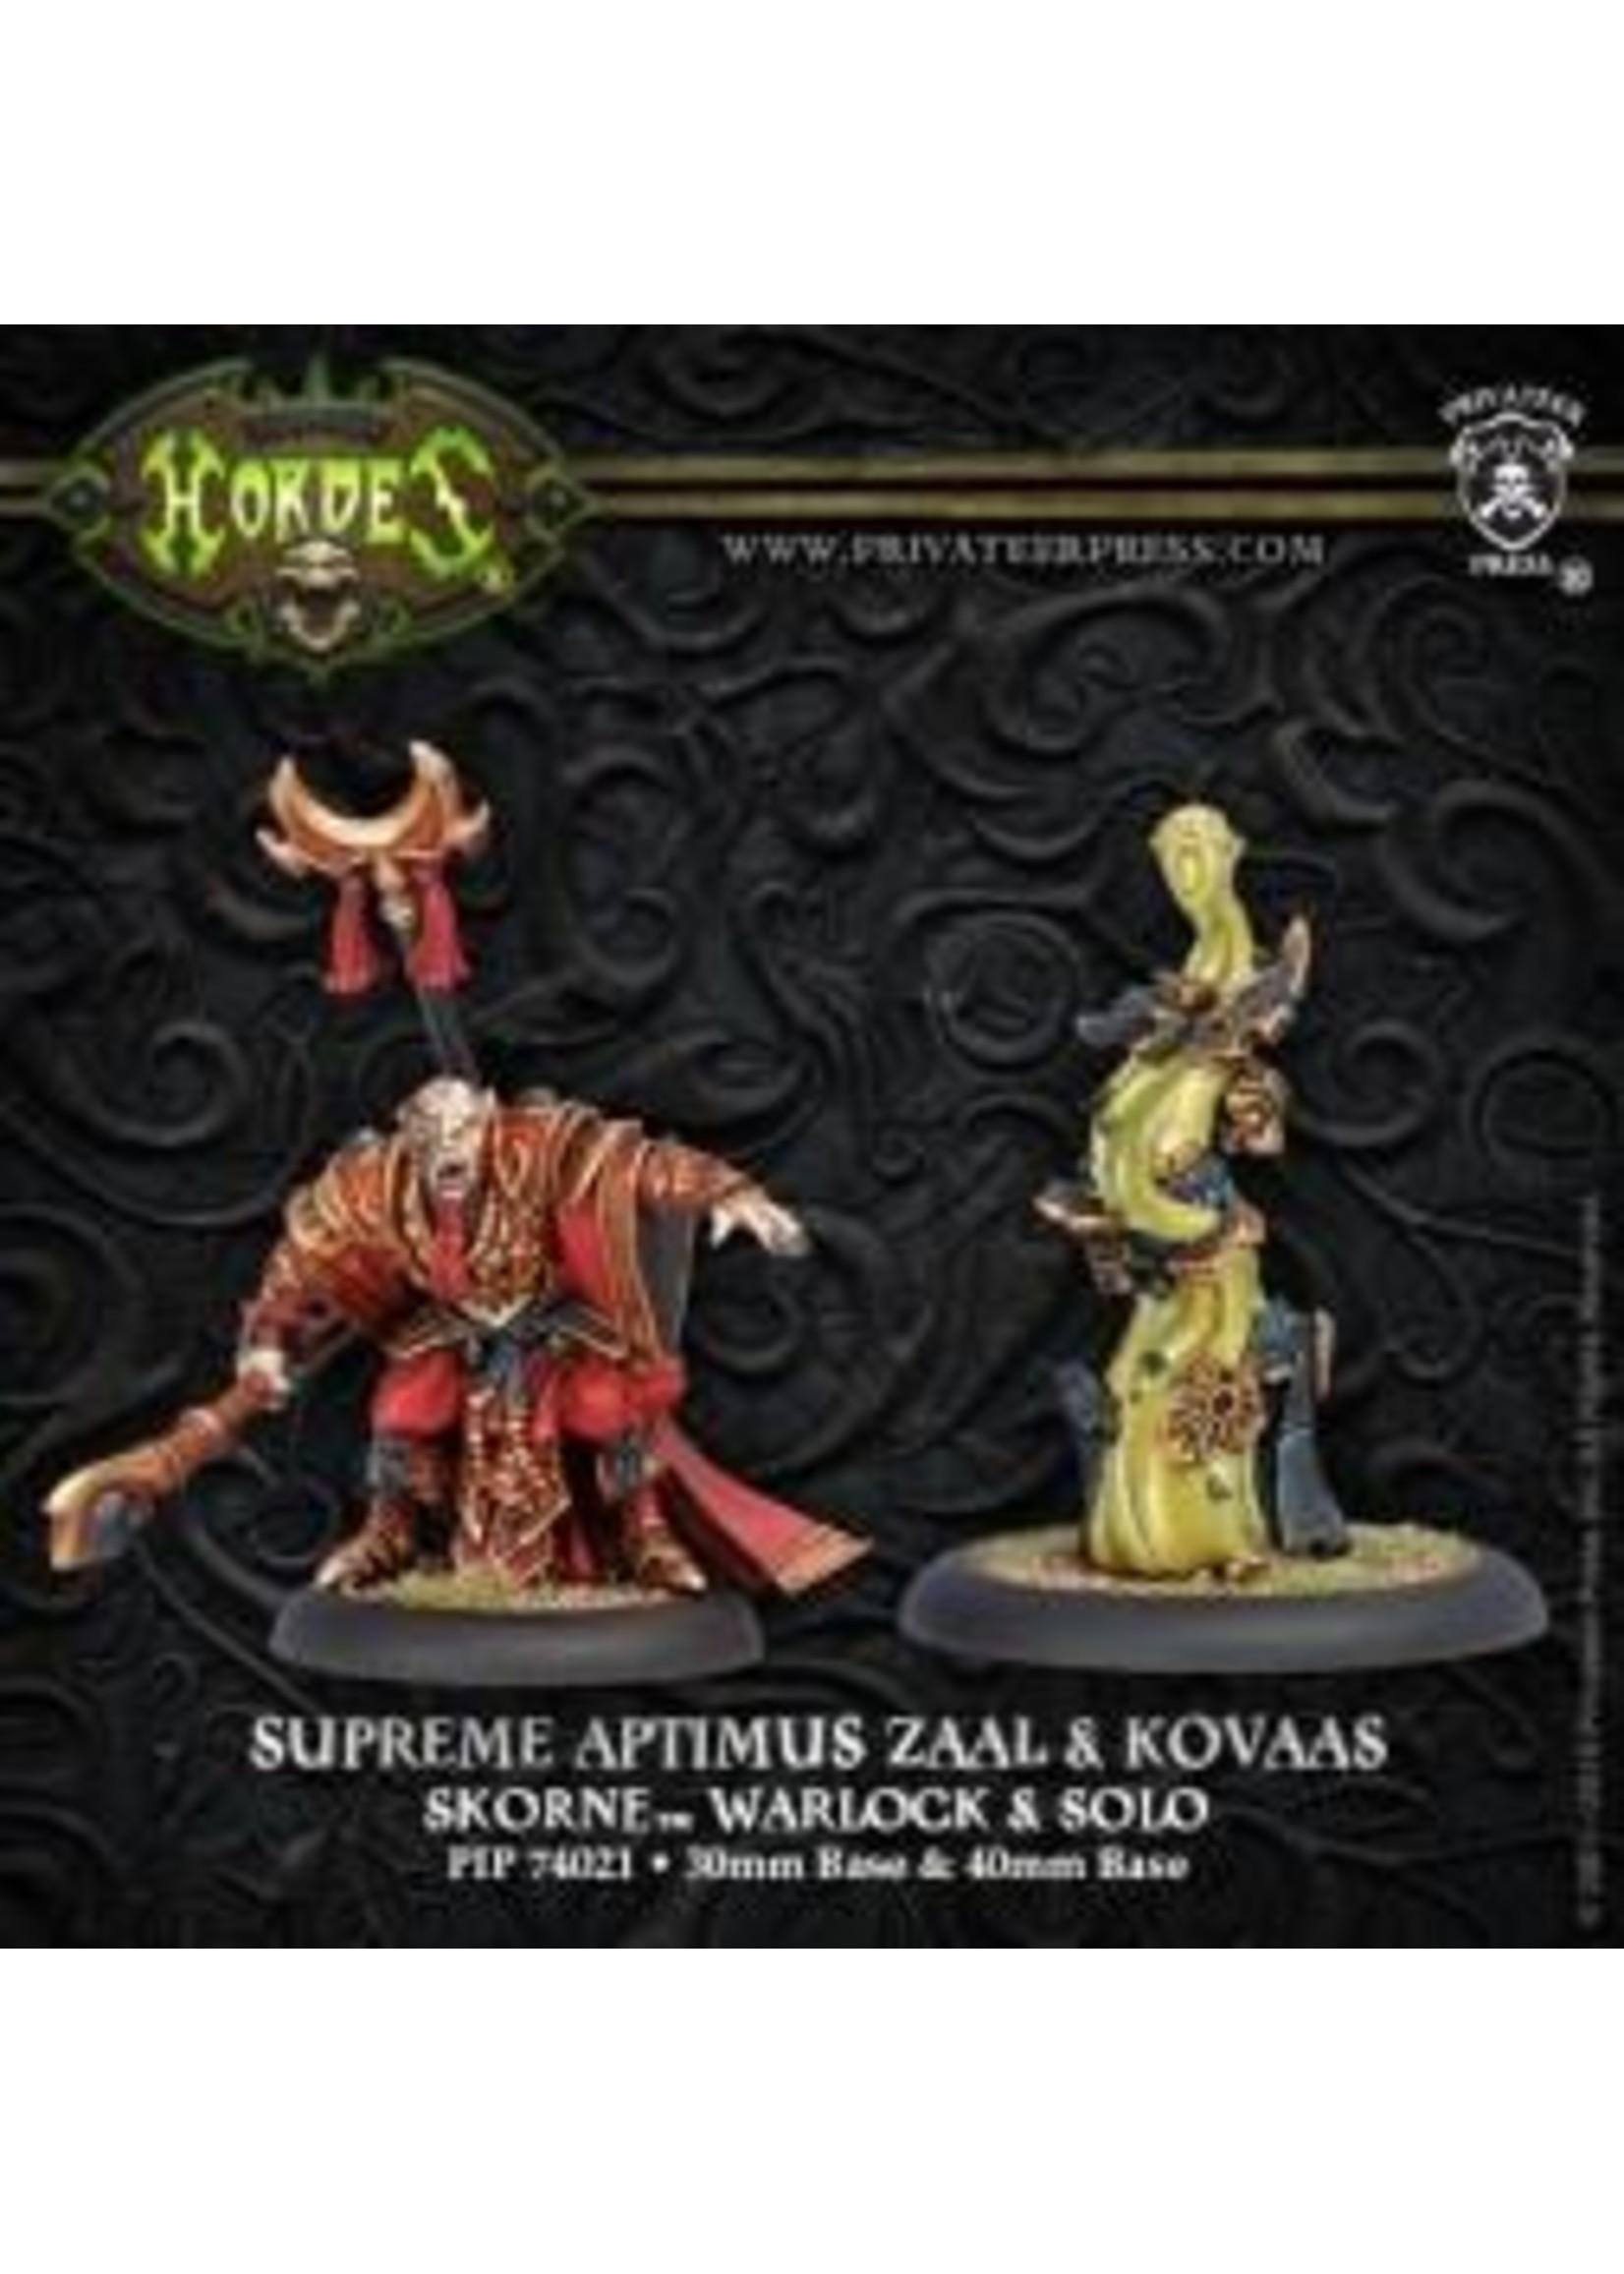 Hordes: Skorne Supreme Aptimus Zaal and Kovaas Warlock and Solo (White Metal)